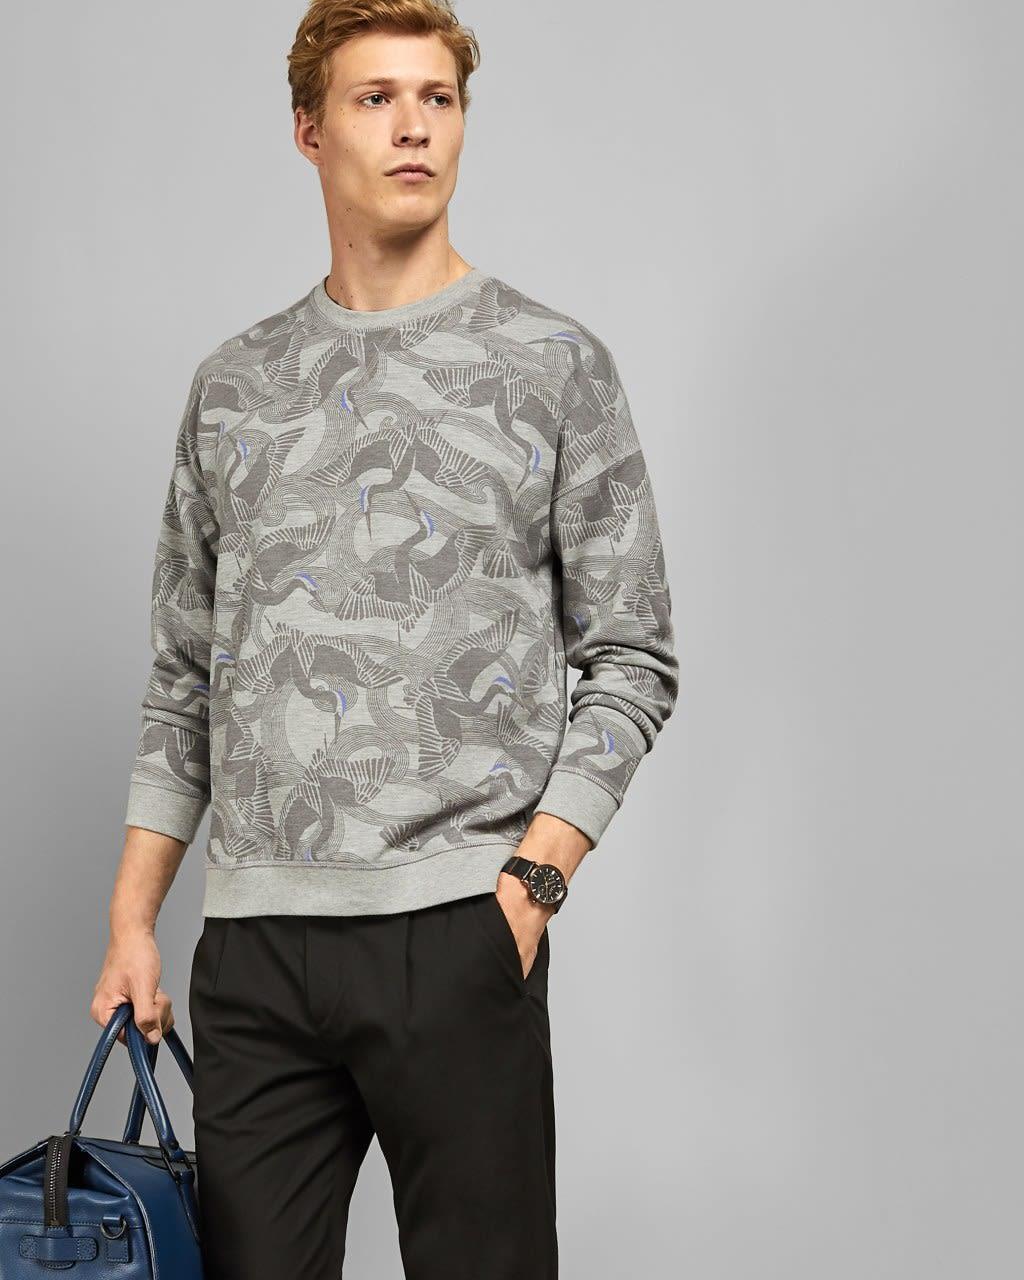 Bird Printed Sweatshirt